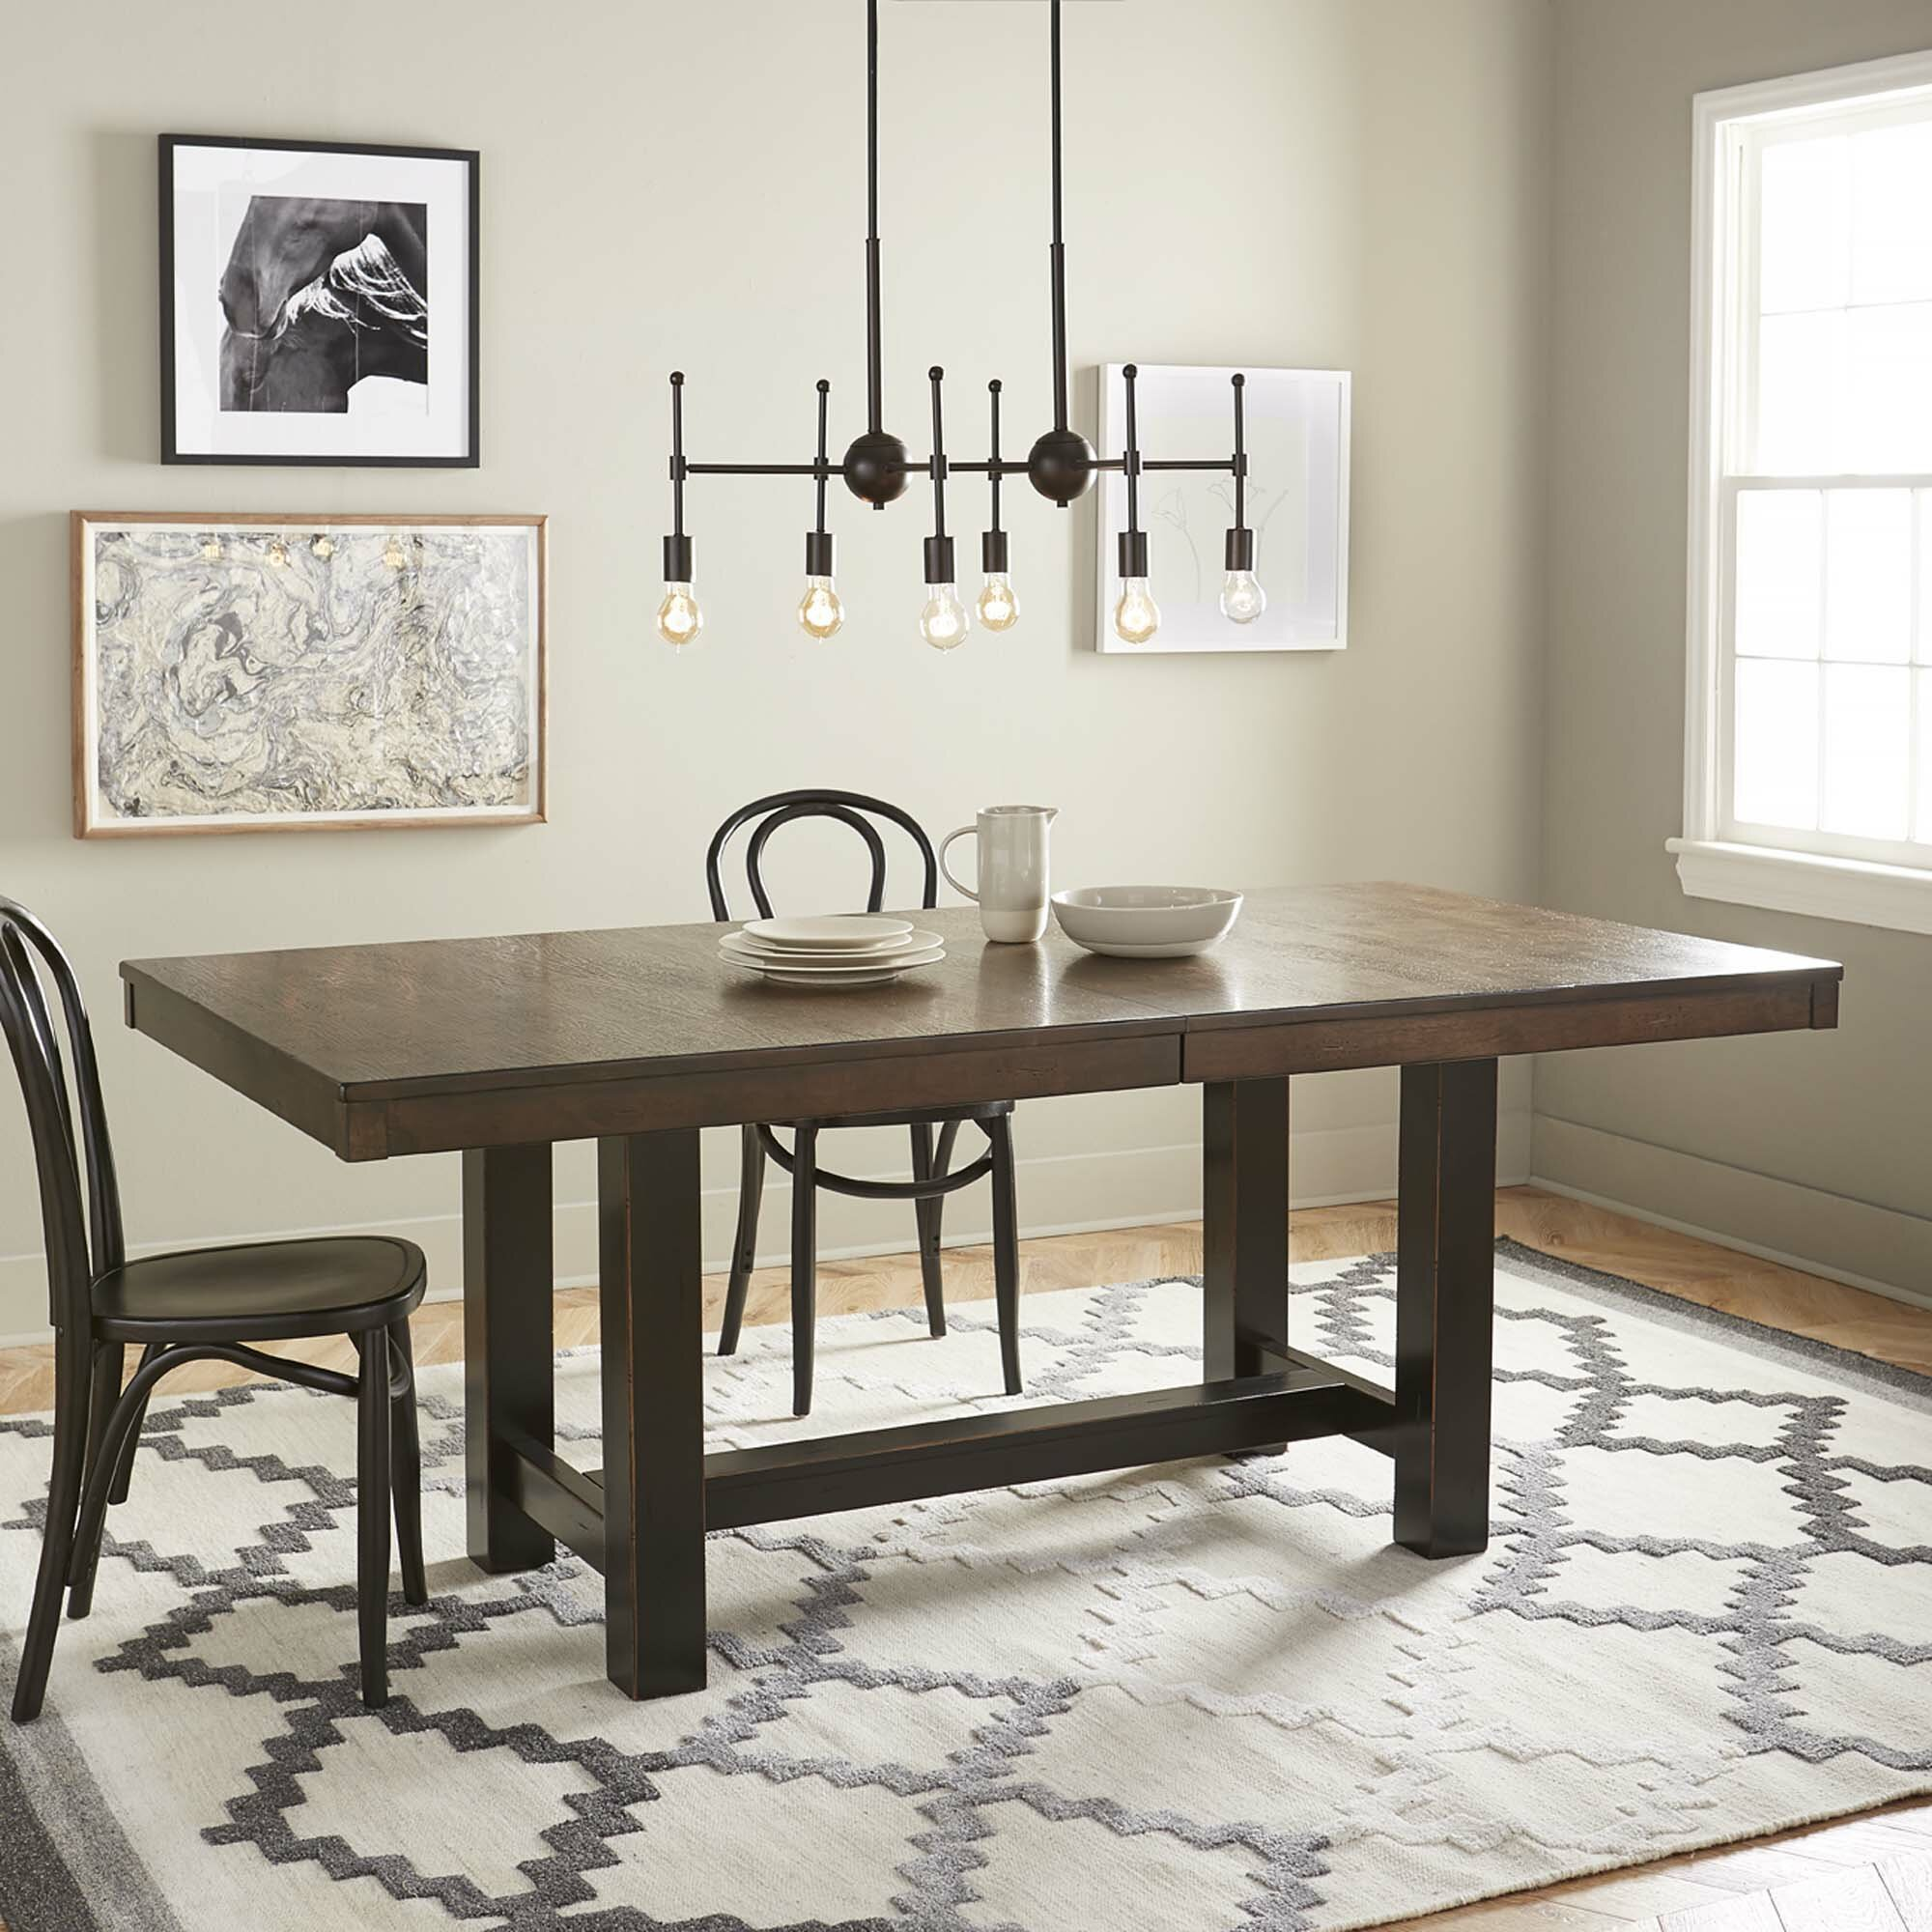 Brayden Studio Mcwhorter Dining Table Reviews: Brayden Studio Lower Shockerwick Extendable Dining Table